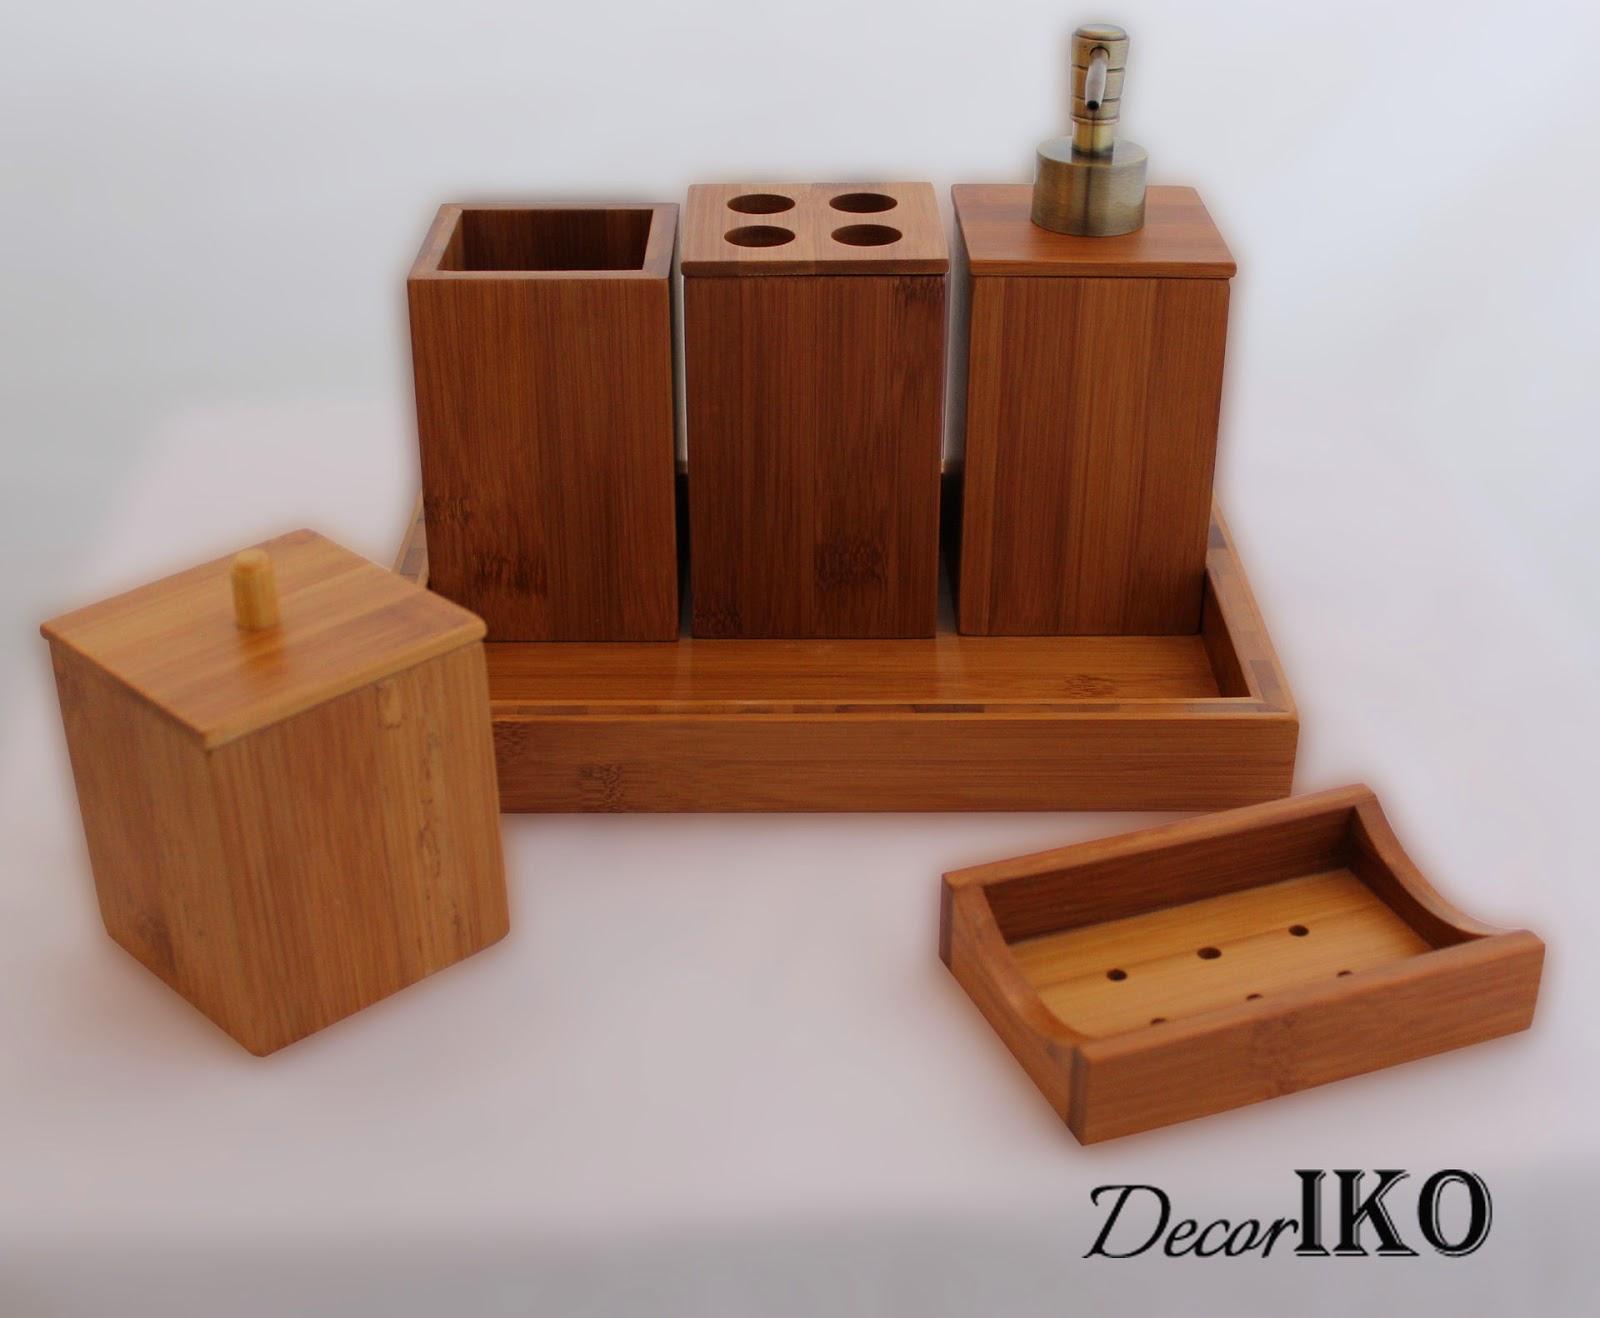 http://decoriko.ru/magazin/product/table_access_ta_0011